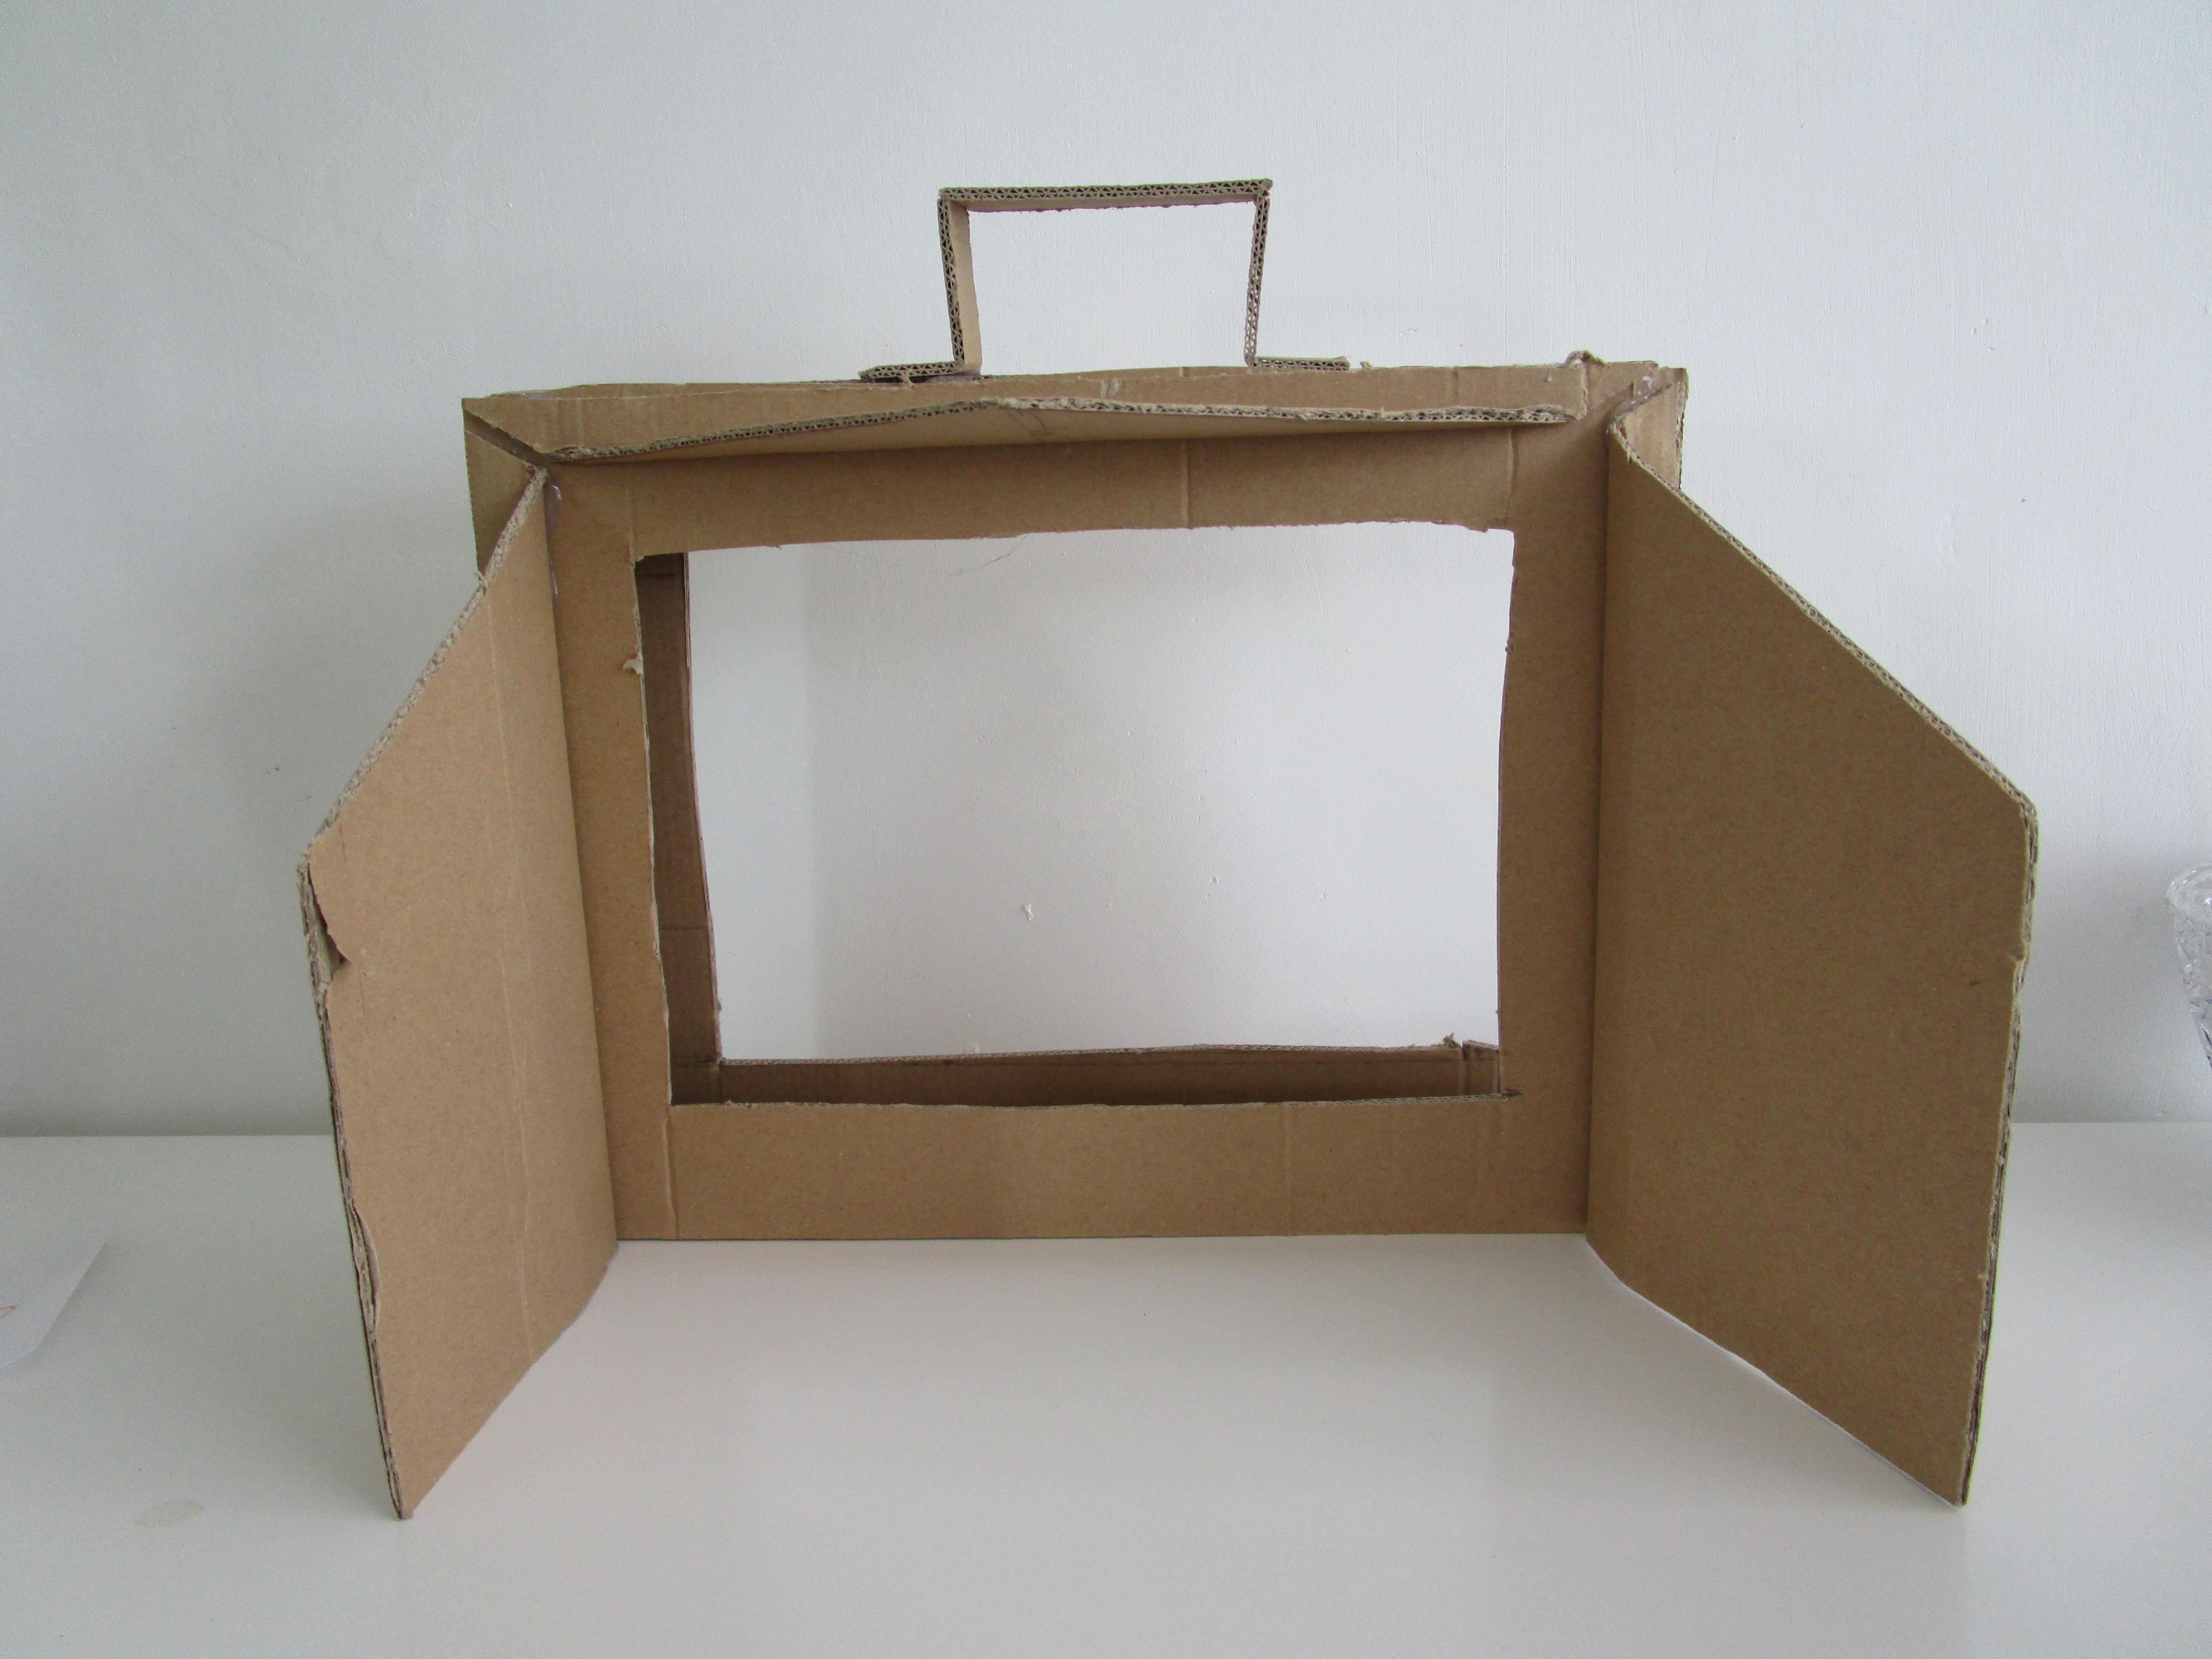 Decorer  Carton En Rondin De Bois